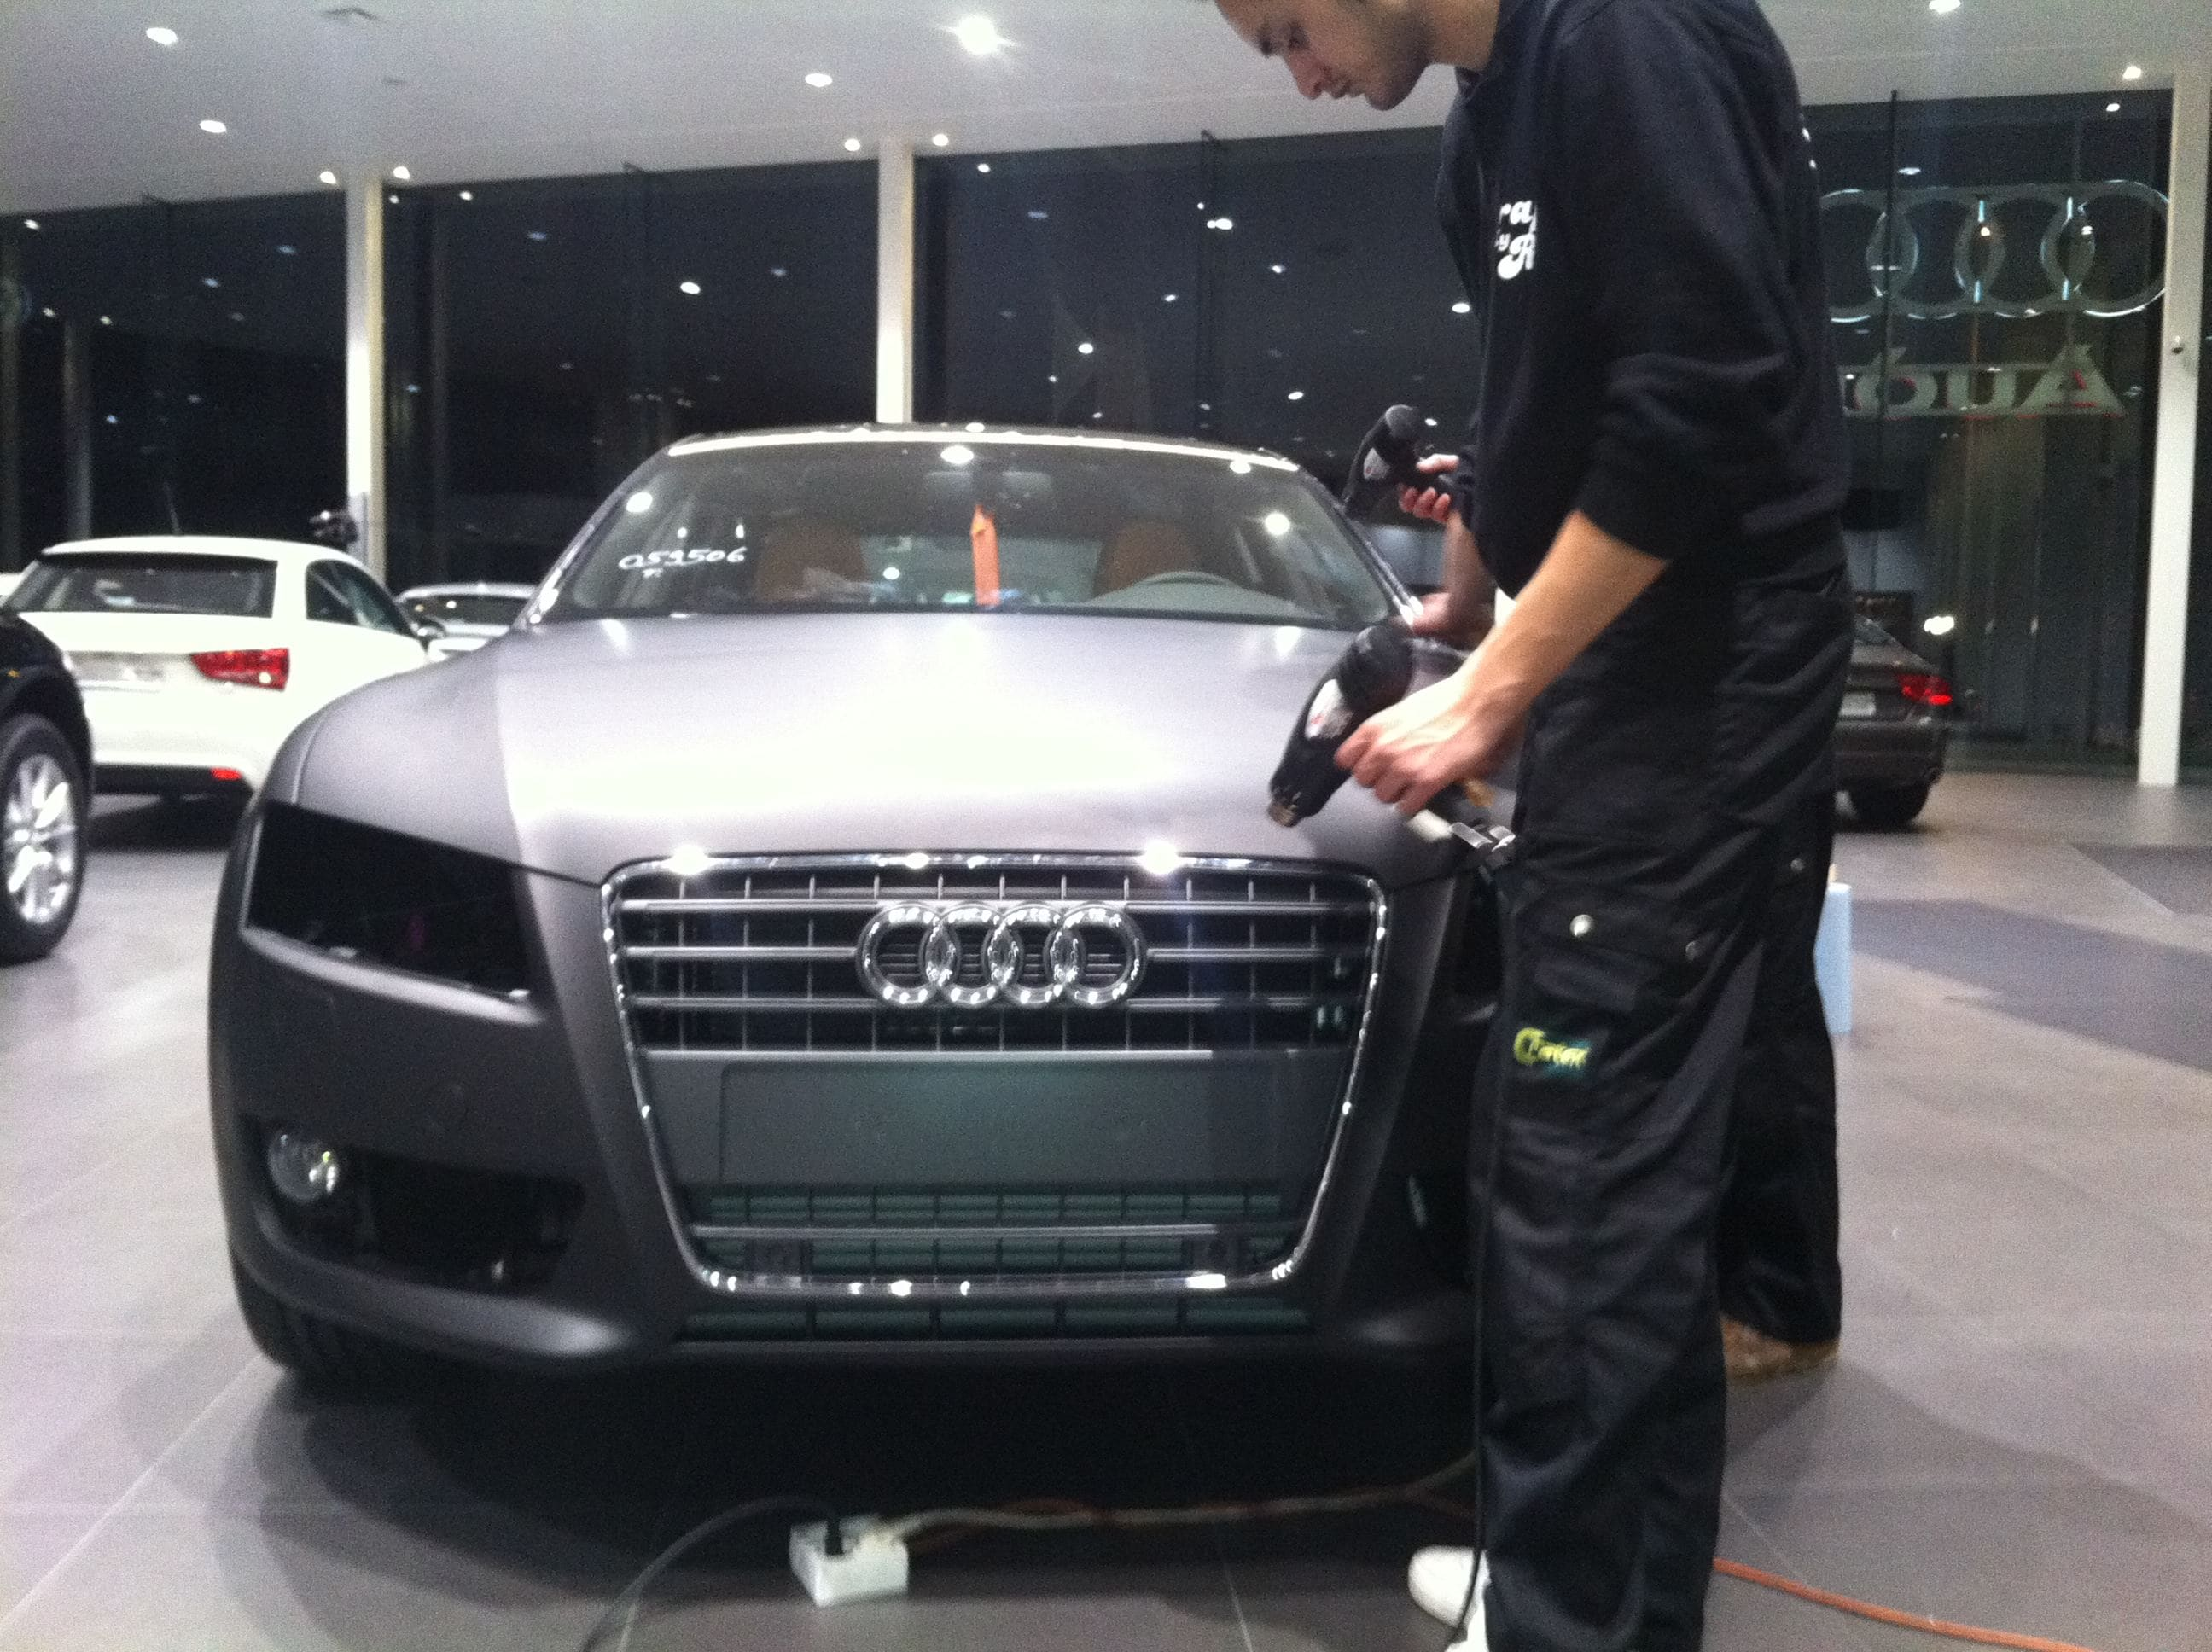 Audi A5 Sportback met Mat Grijze Wrap, Carwrapping door Wrapmyride.nu Foto-nr:4779, ©2021